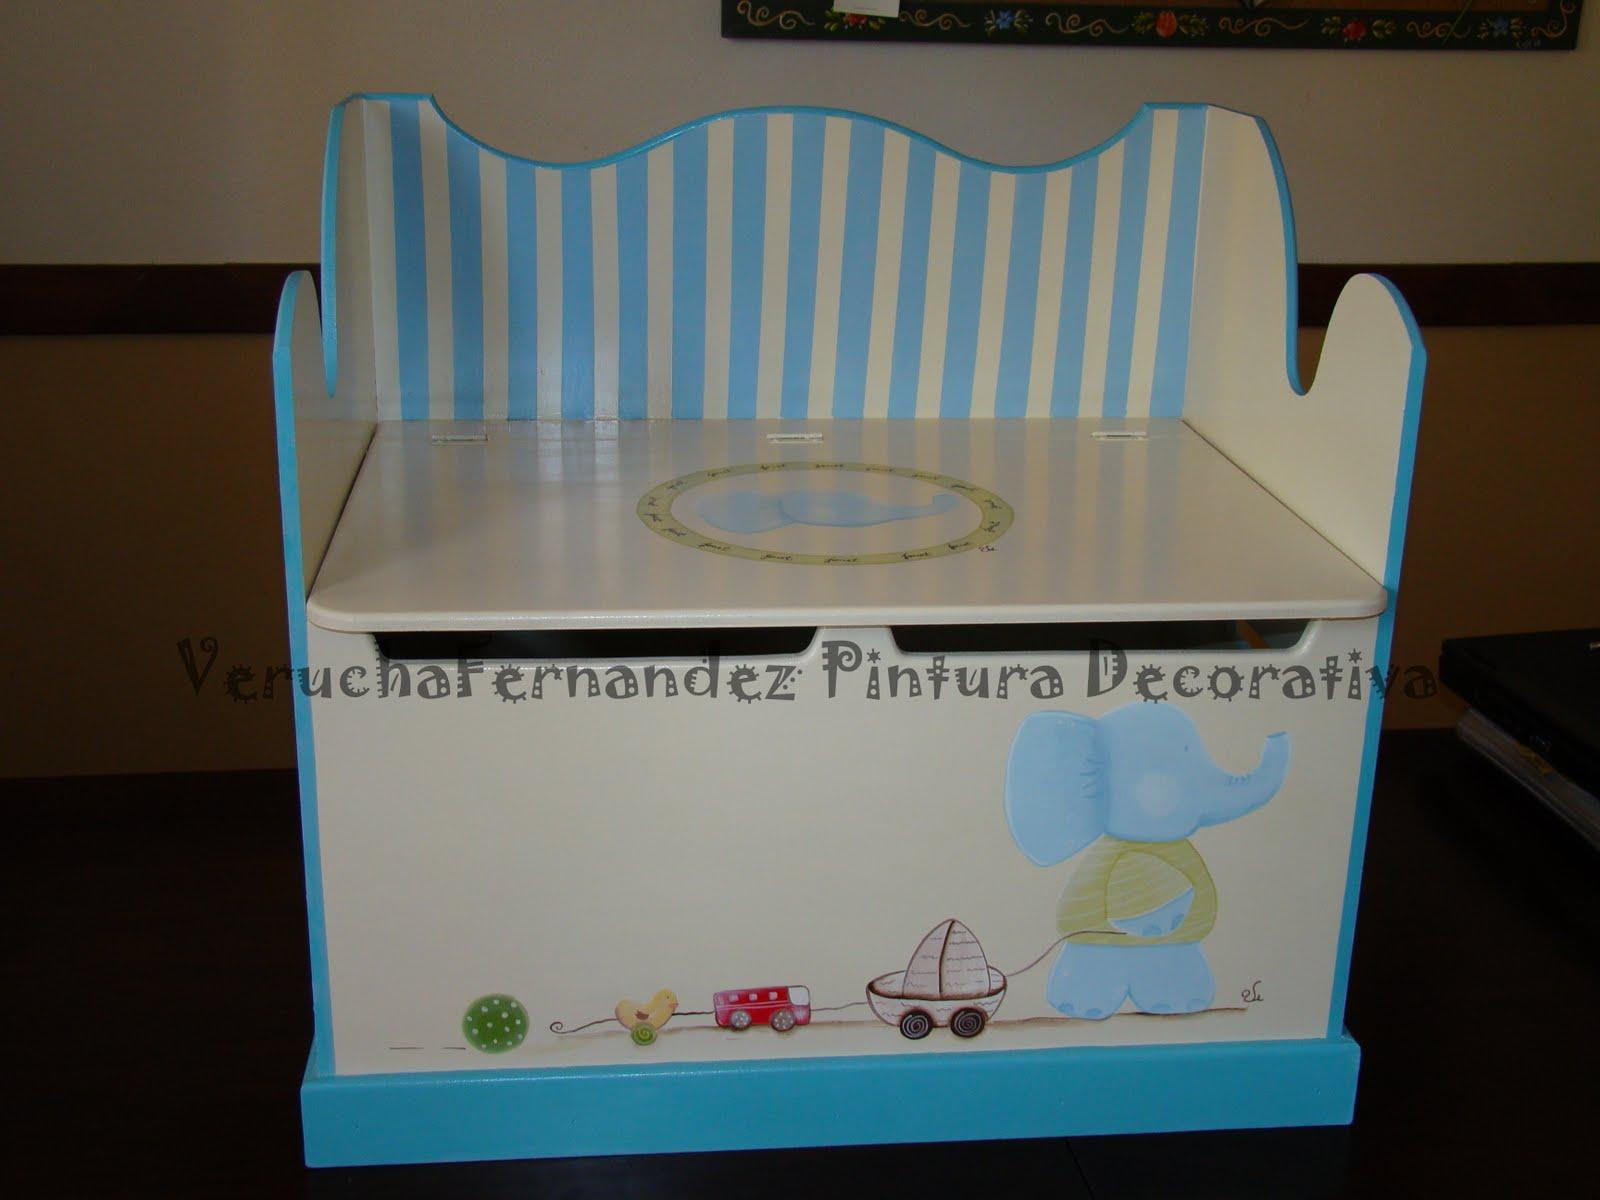 Pintura decorativa baul asiento para guardar juguetes - Baul para guardar juguetes ...